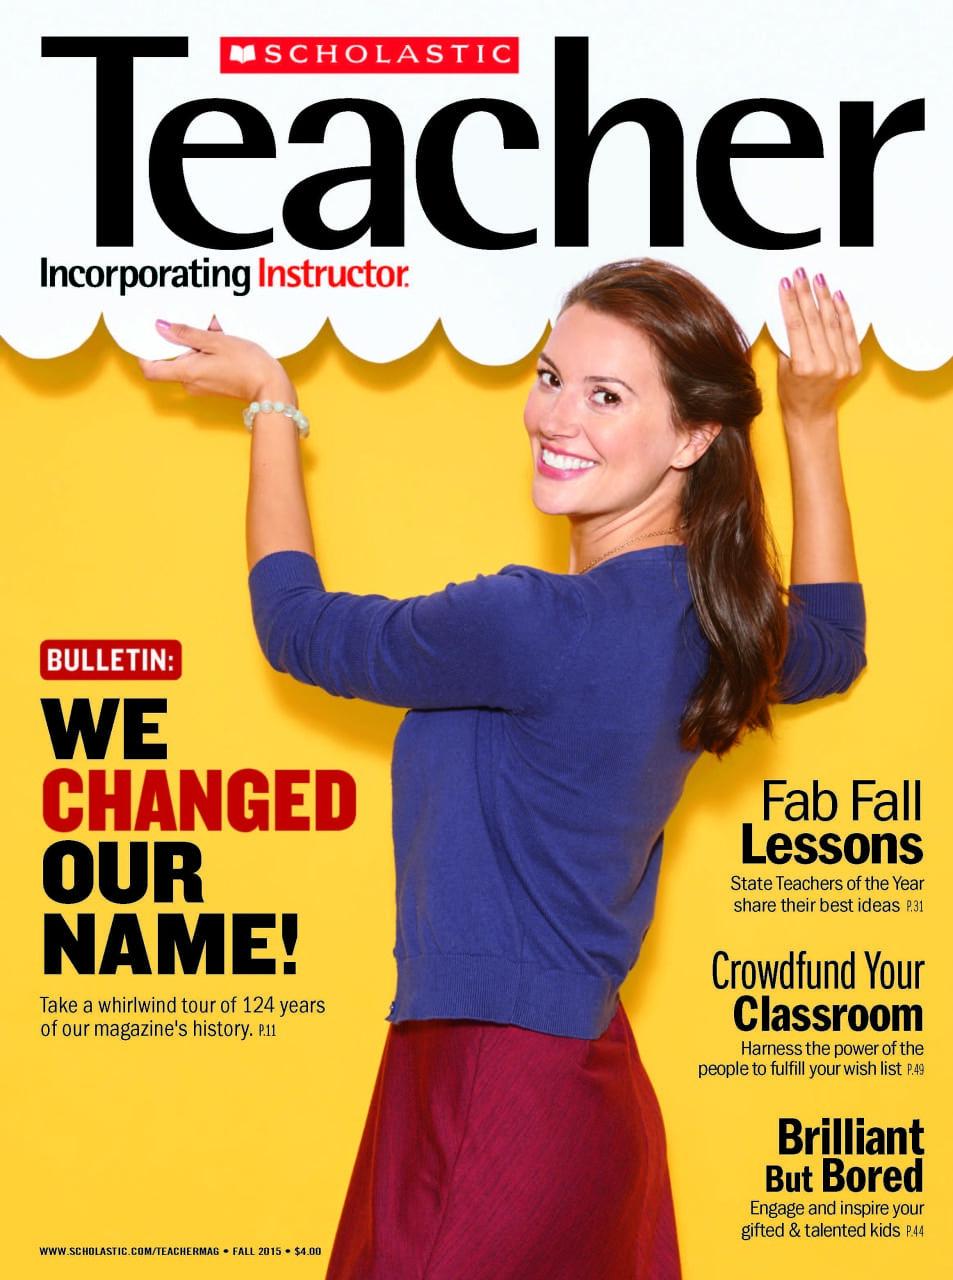 SCHOLASTIC_TEACHER_B2B_Full_Issue_Eddies